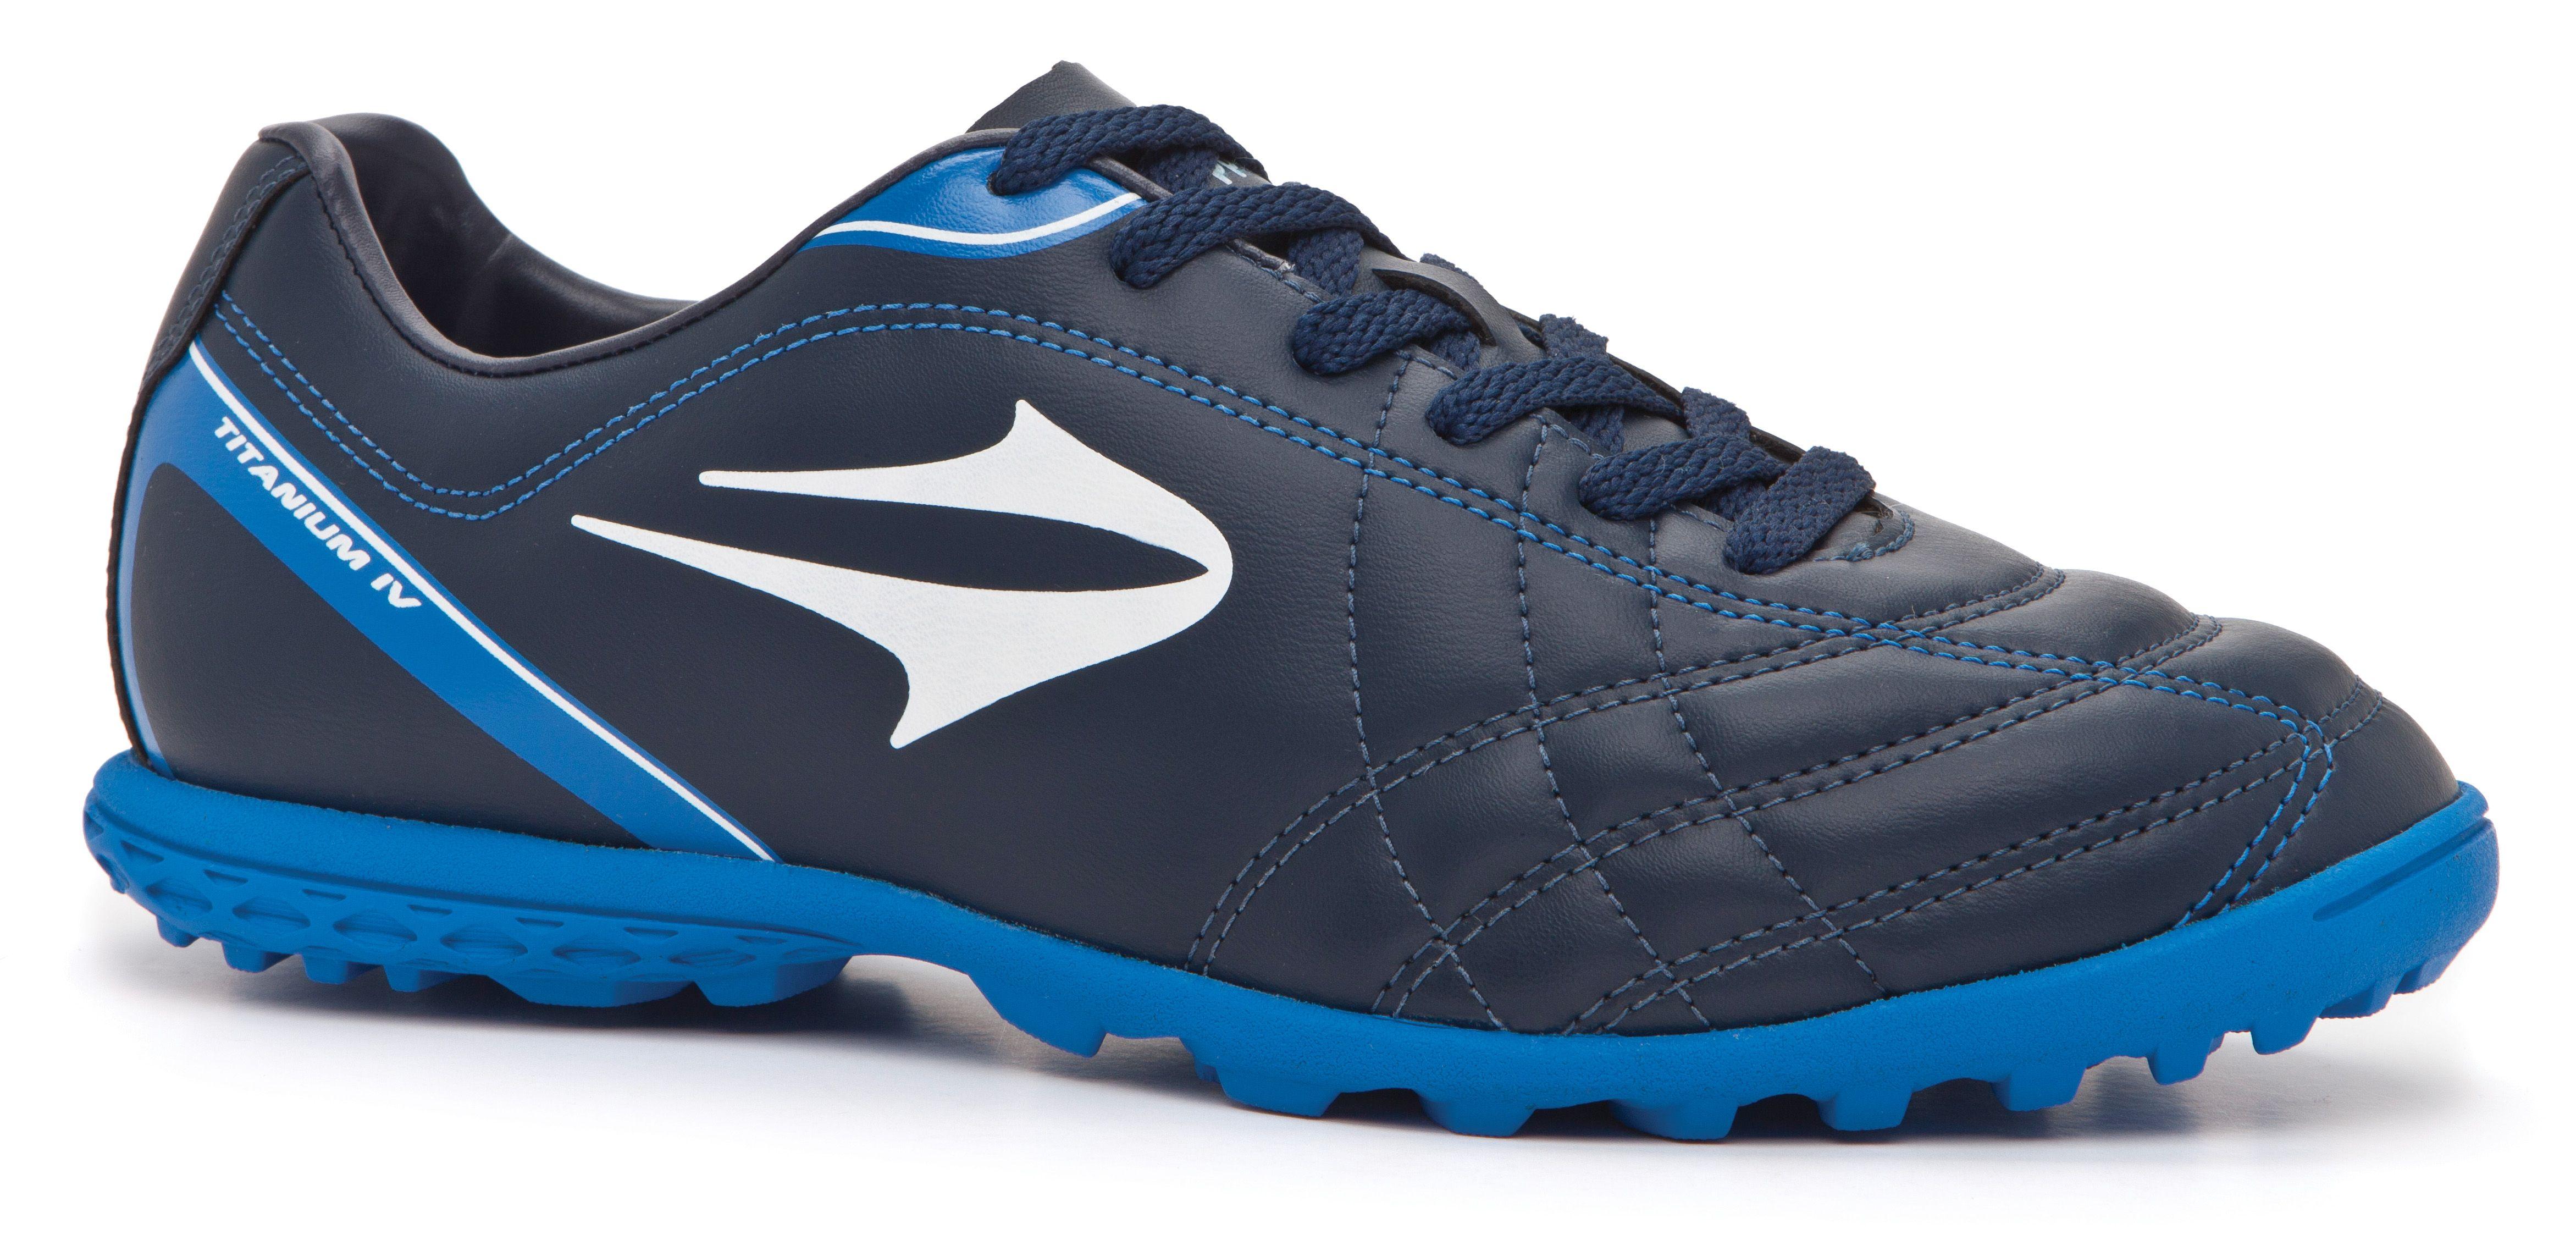 2015 chuteira Topper society Titanium IV marinho azul  7800428e983ad